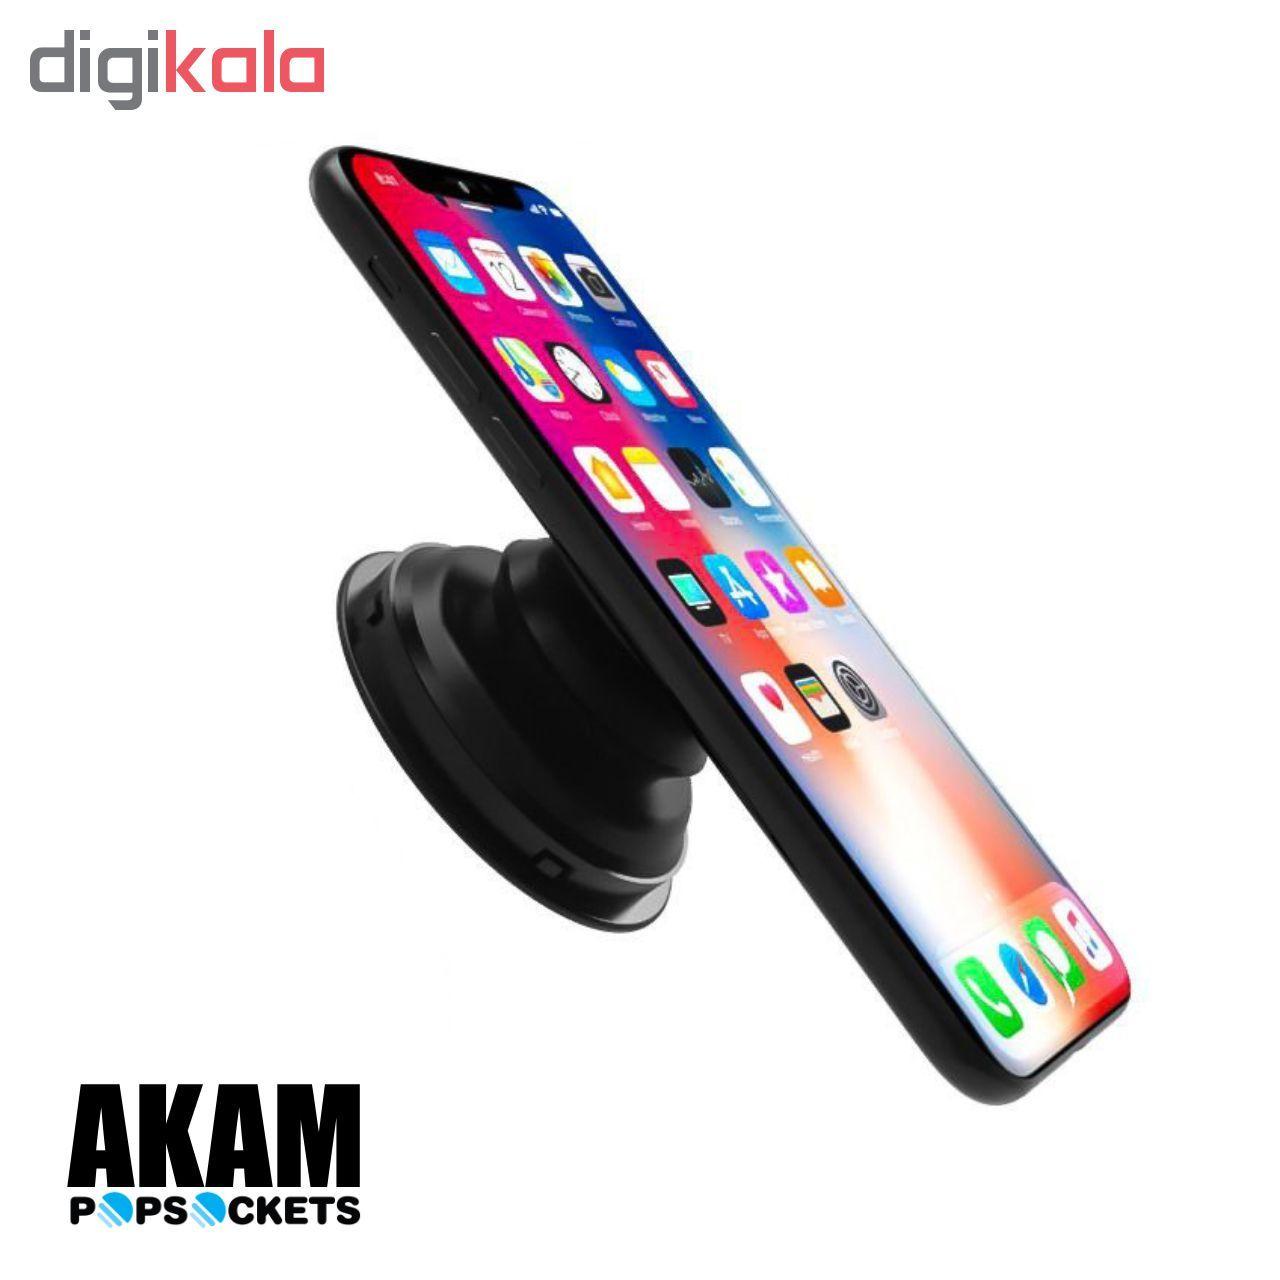 پایه نگهدارنده گوشی موبایل پاپ سوکت آکام مدل APS0058 main 1 7